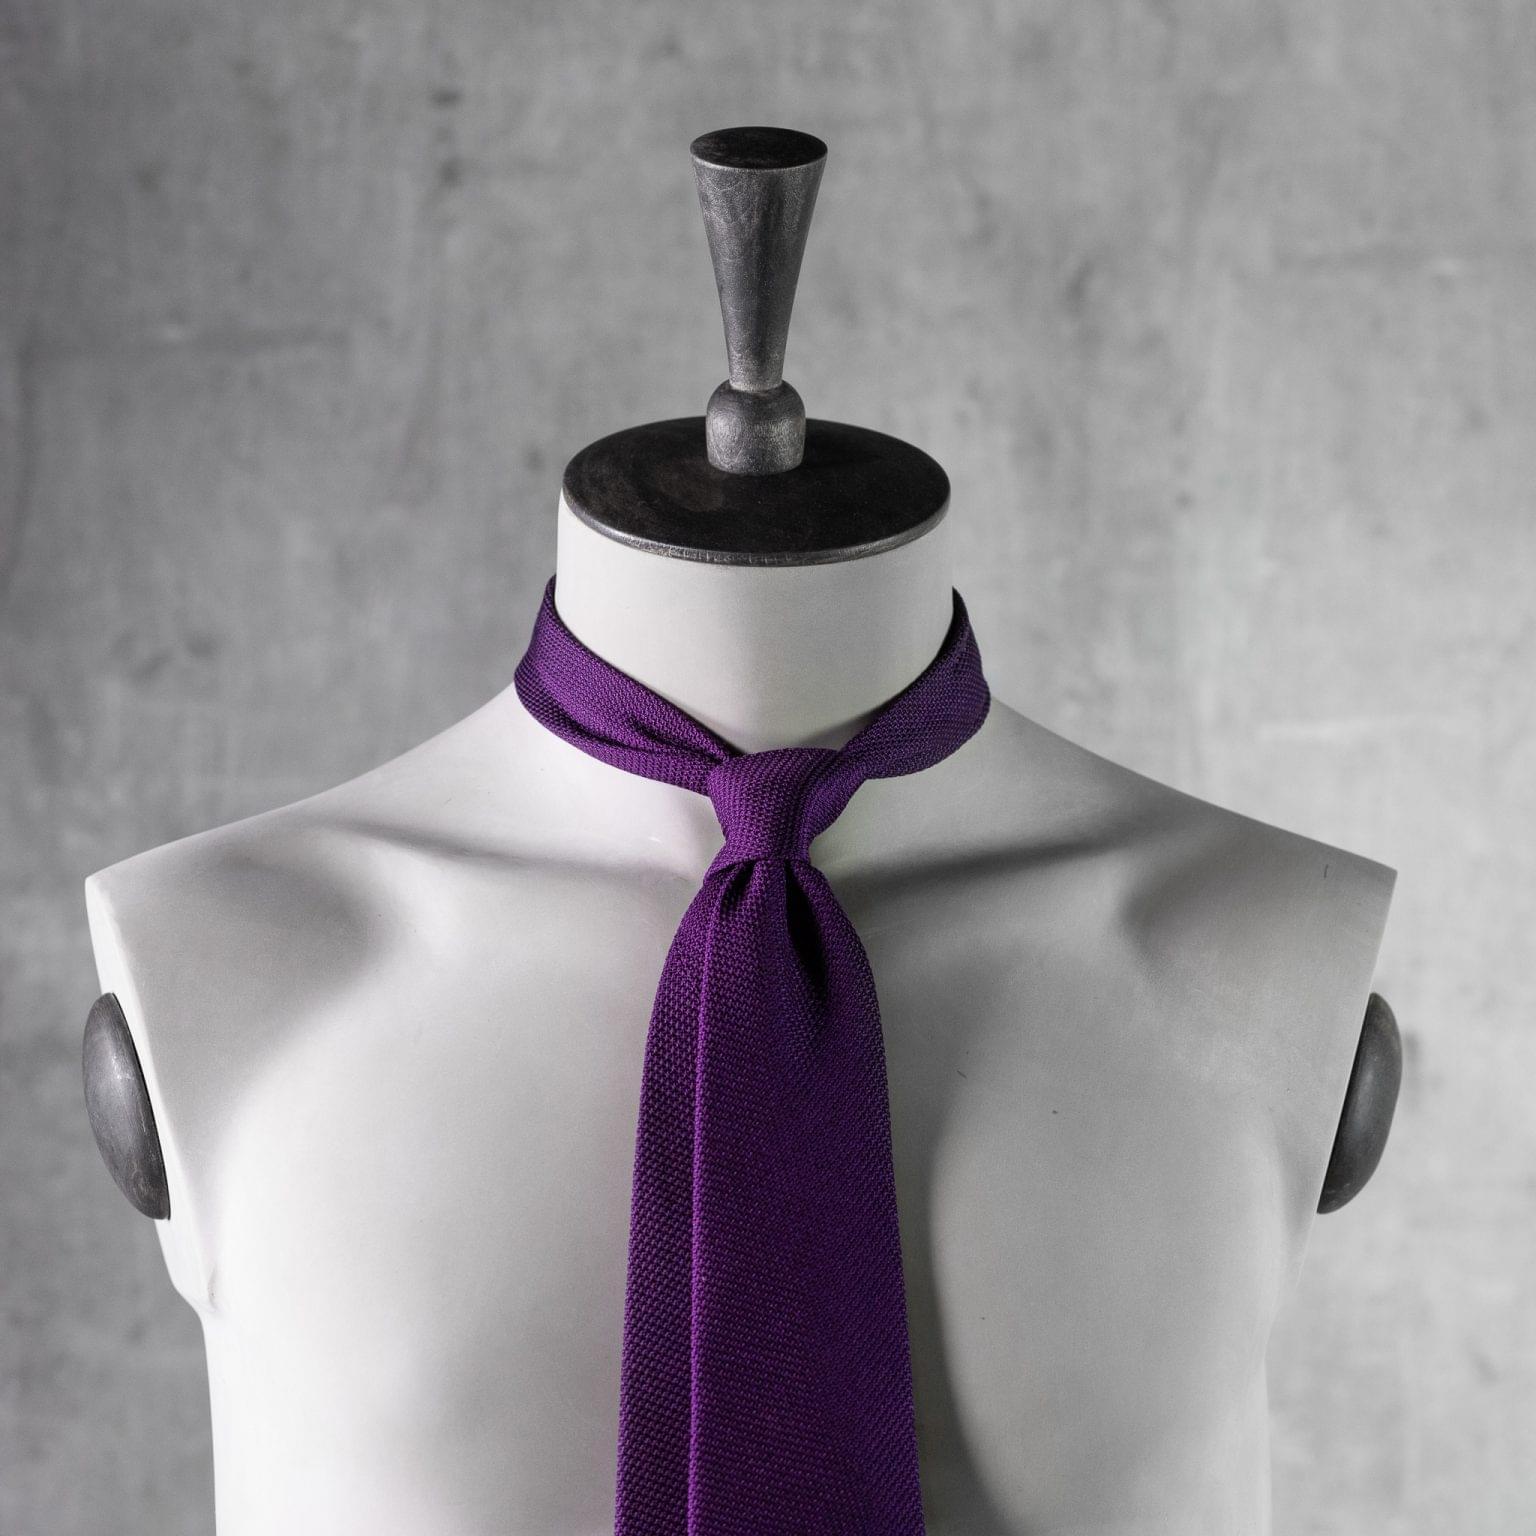 GRENADINE-0157-Tie-Initials-Corbata-Iniciales-The-Seelk-3